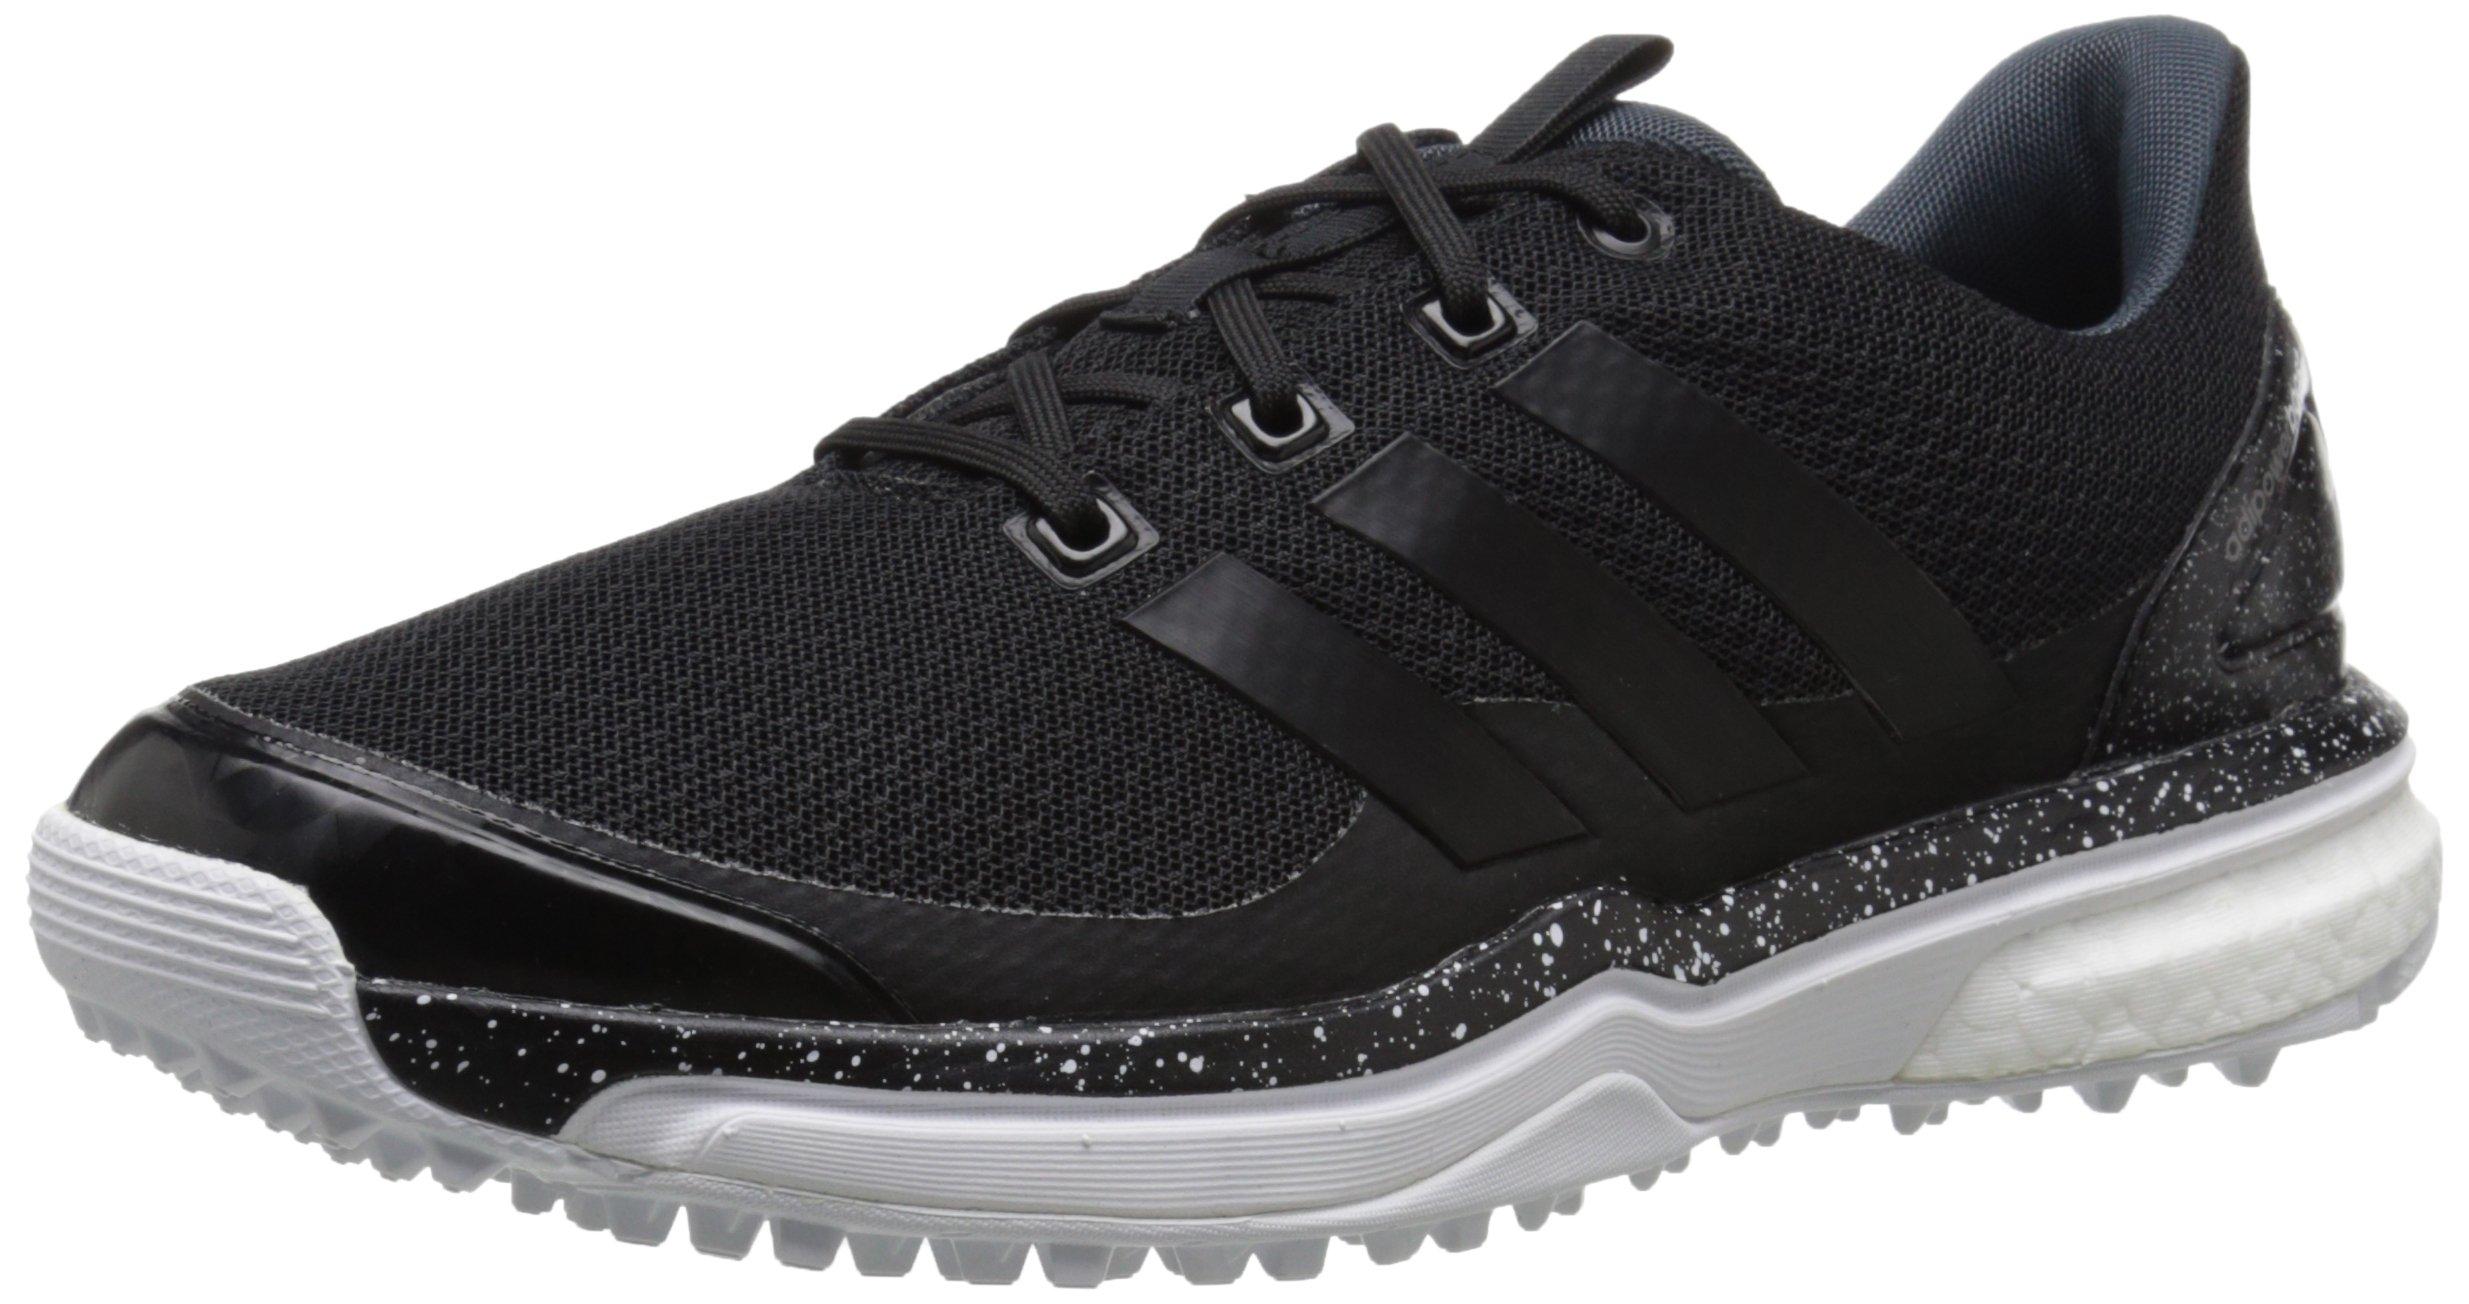 new concept 187ea fe2b8 Galleon - Adidas Men s Adipower S Boost 2-M, Core Black FTWR White, 11 M US